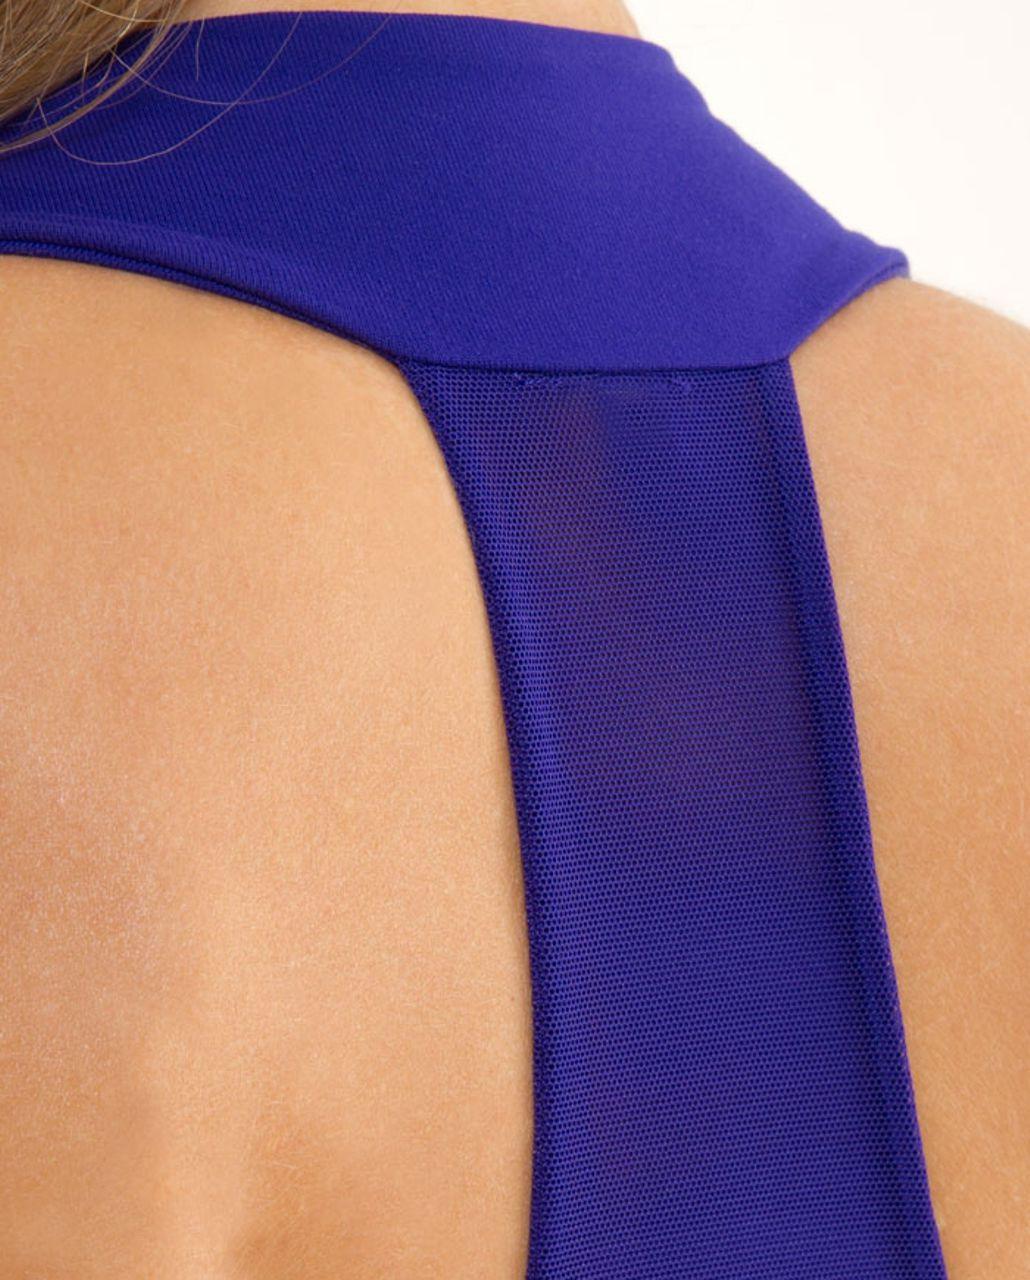 Lululemon Scoop Neck Tank - Pigment Blue White Narrow Bold Stripe /  Pigment Blue